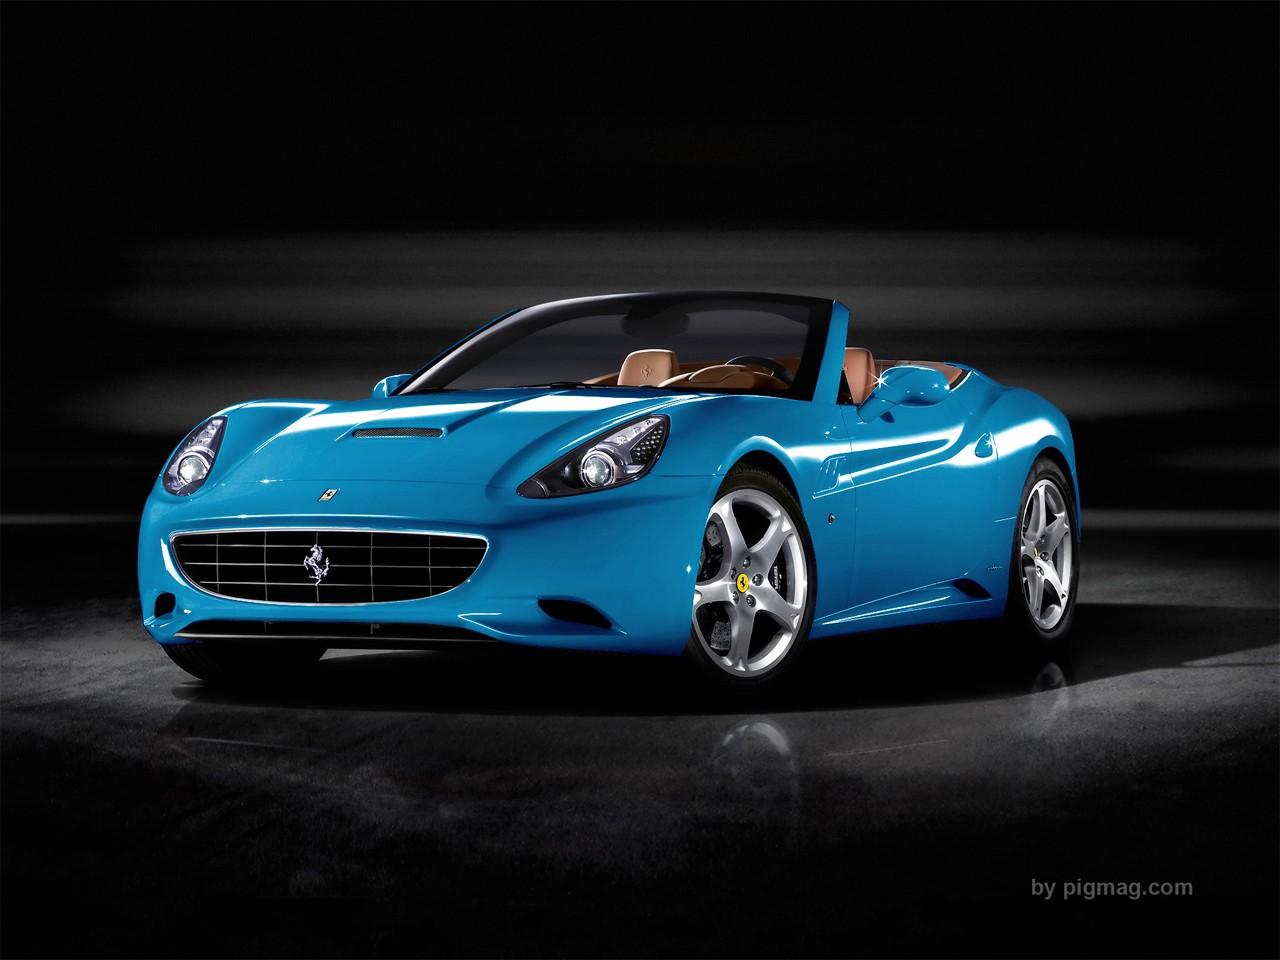 1230carswallpapers sky blue ferrari - Ferrari 458 Blue Wallpaper